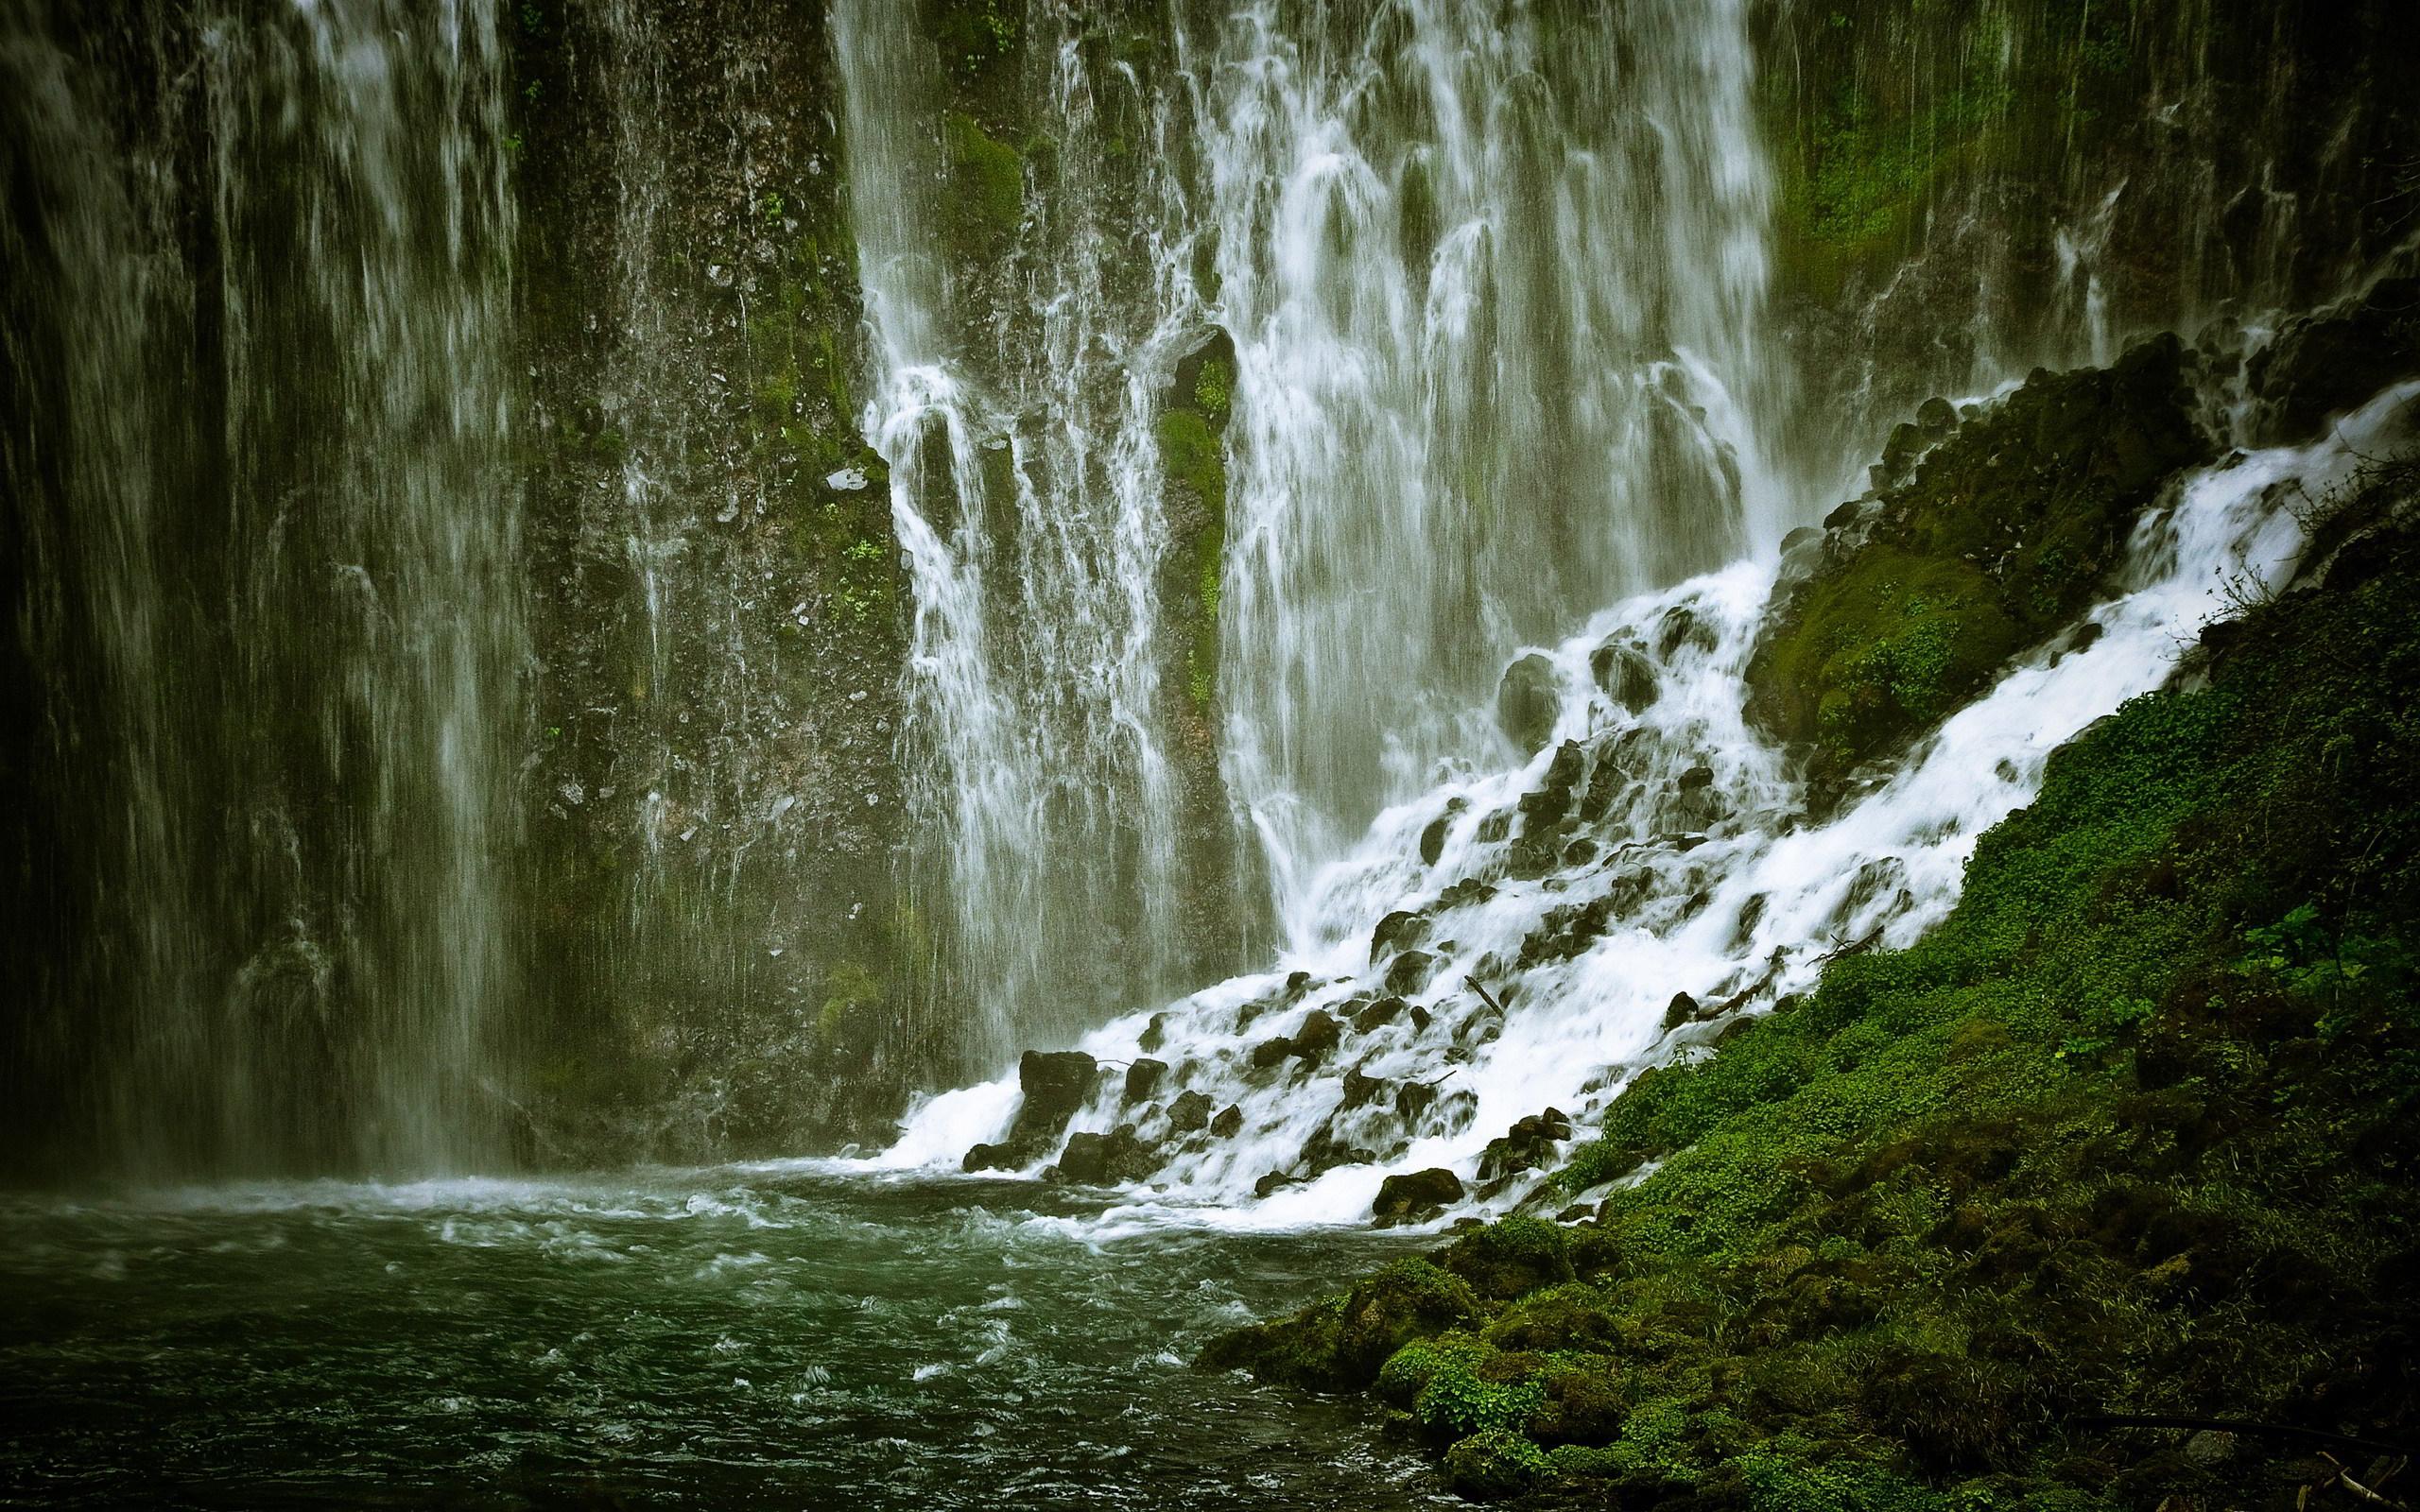 waterfall background nice